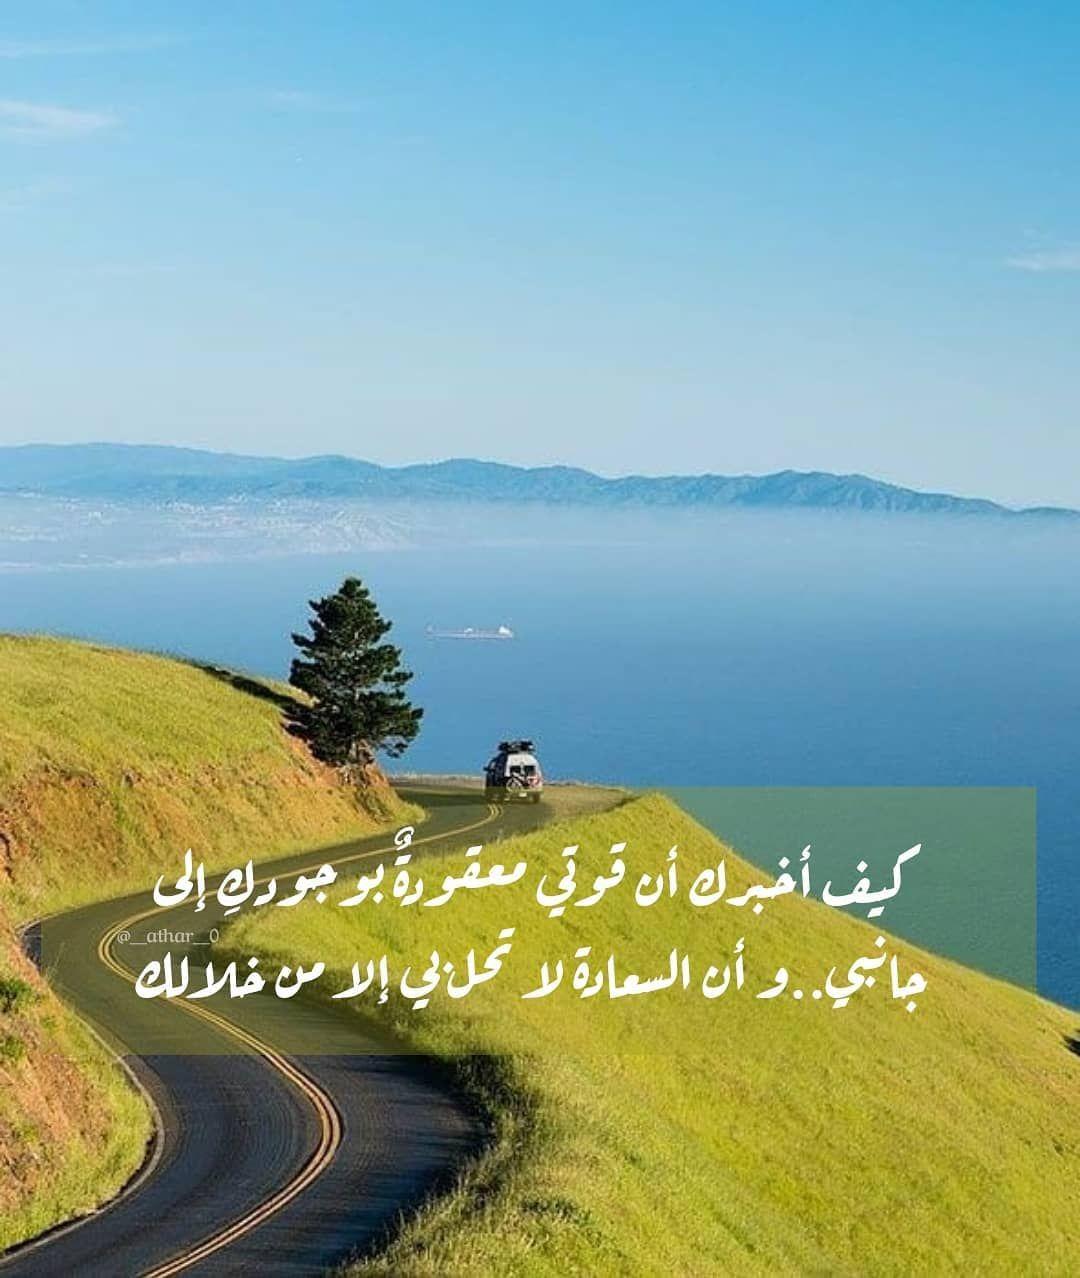 Pin By Athar On Writing Natural Landmarks Landmarks Travel